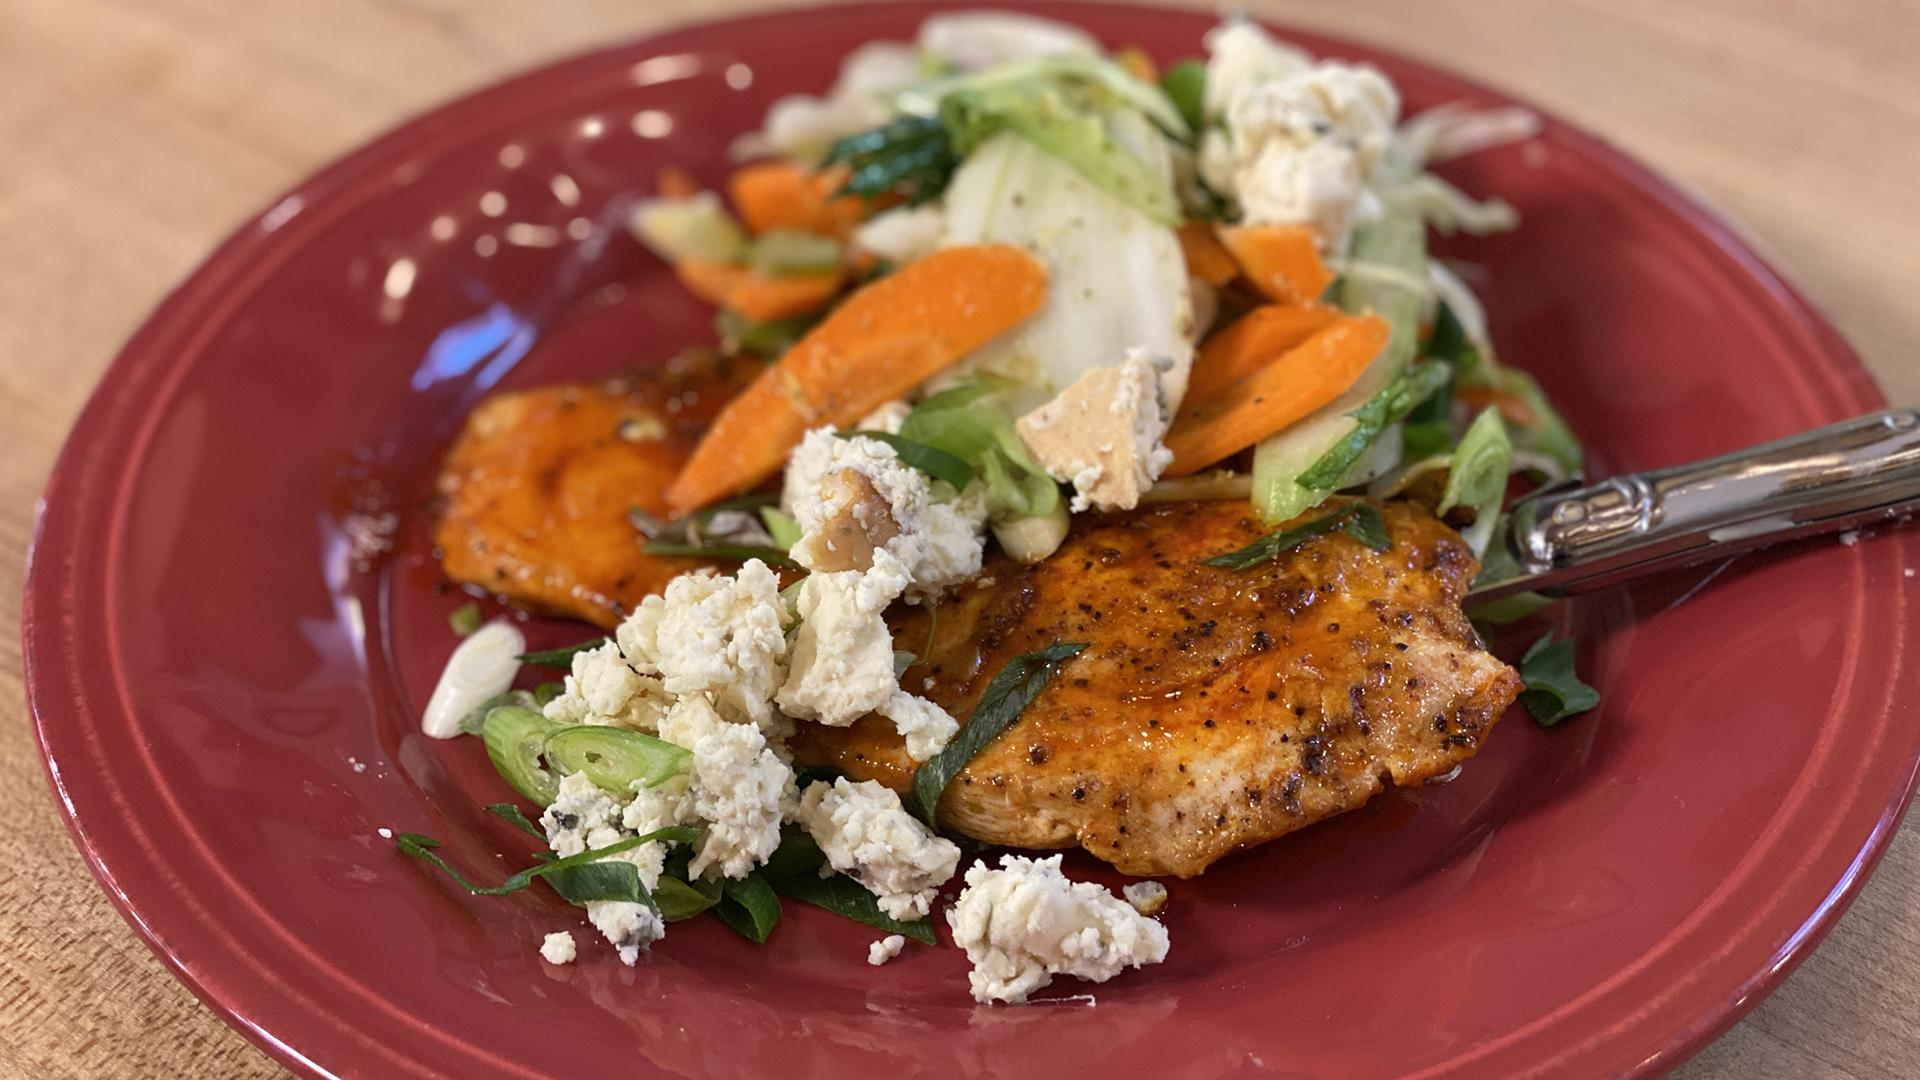 Buffalo Chicken Paillard With Slaw, Blue Cheese & Scallions